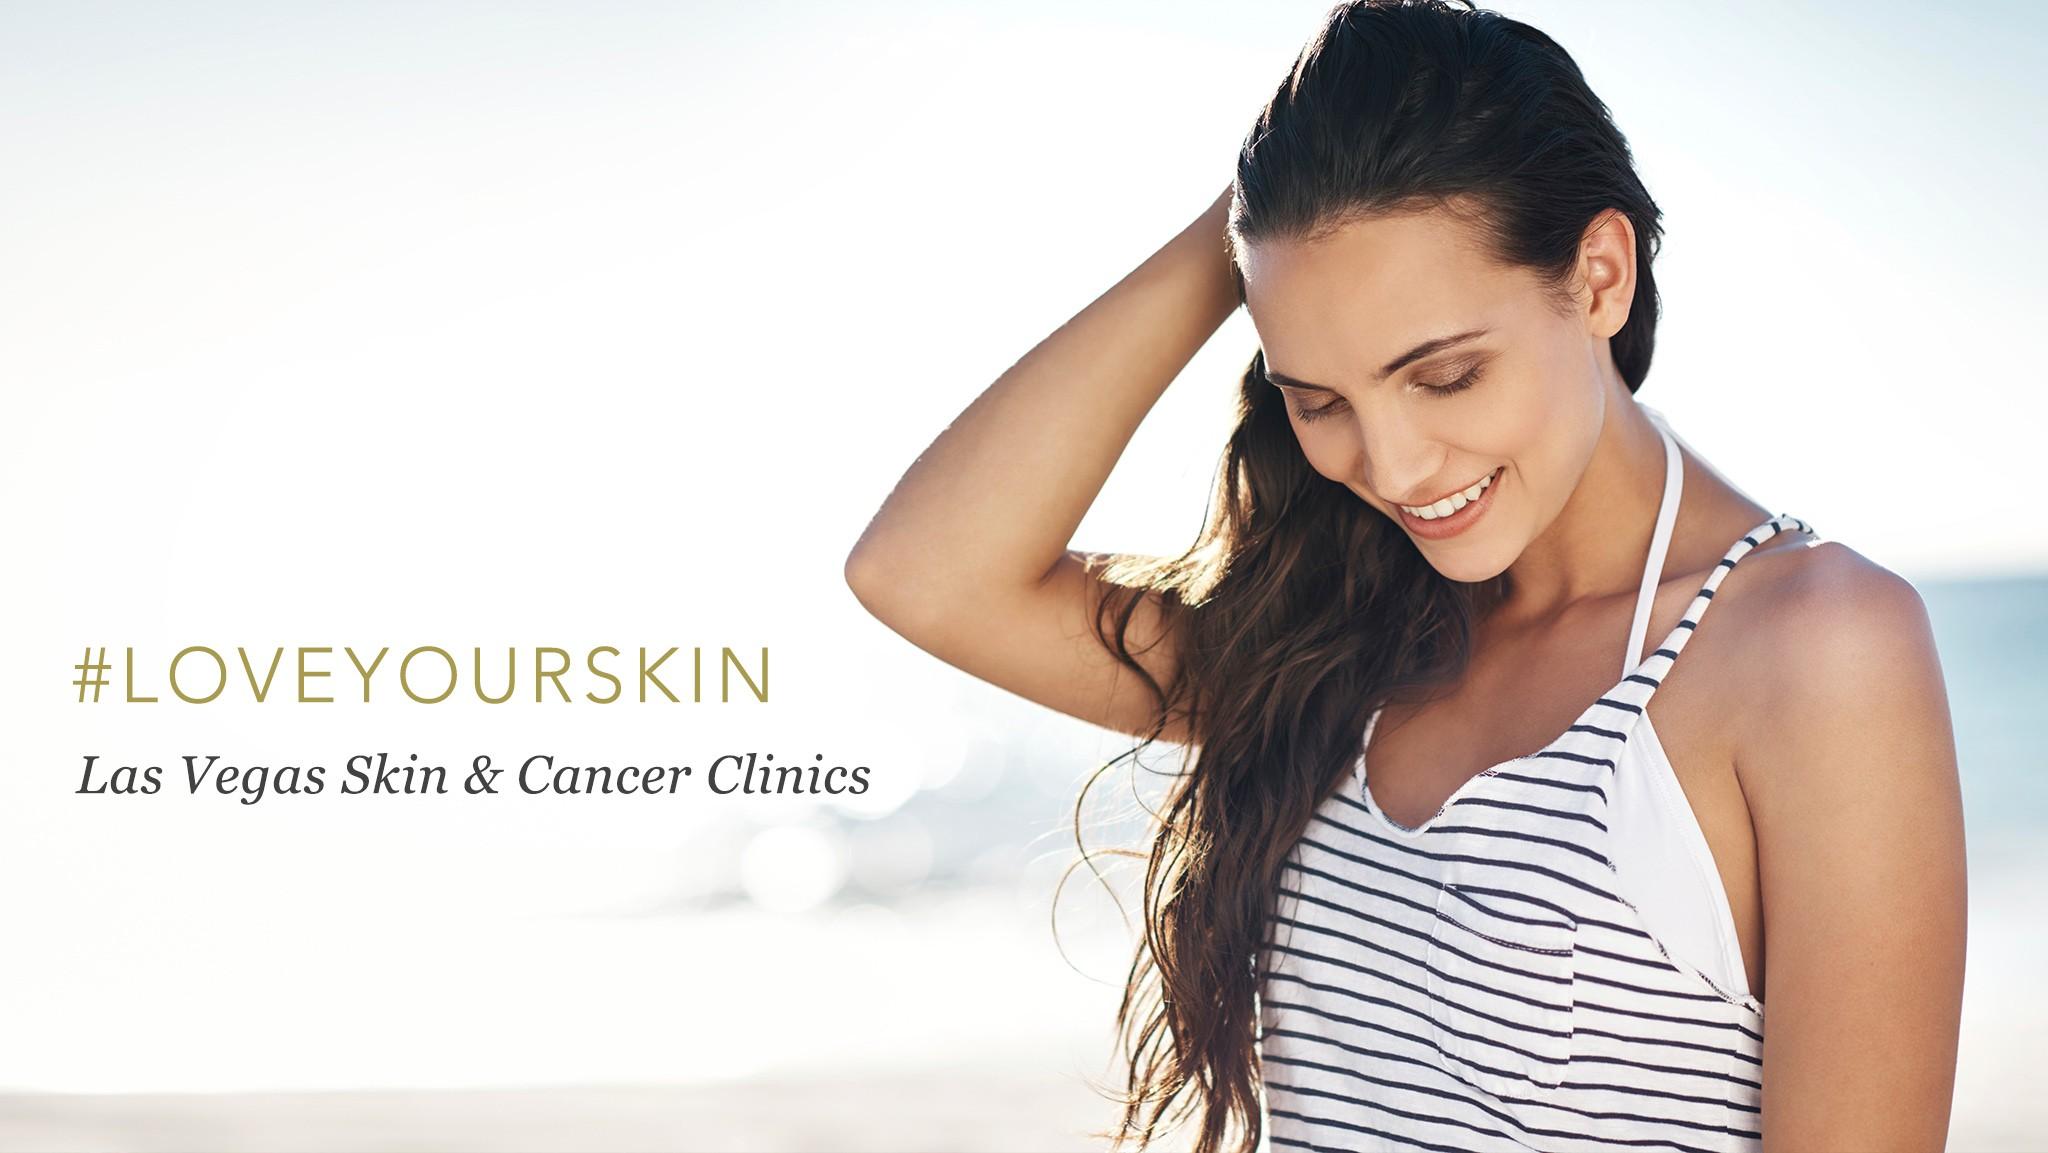 Las Vegas Skin Cancer Clinic Linkedin